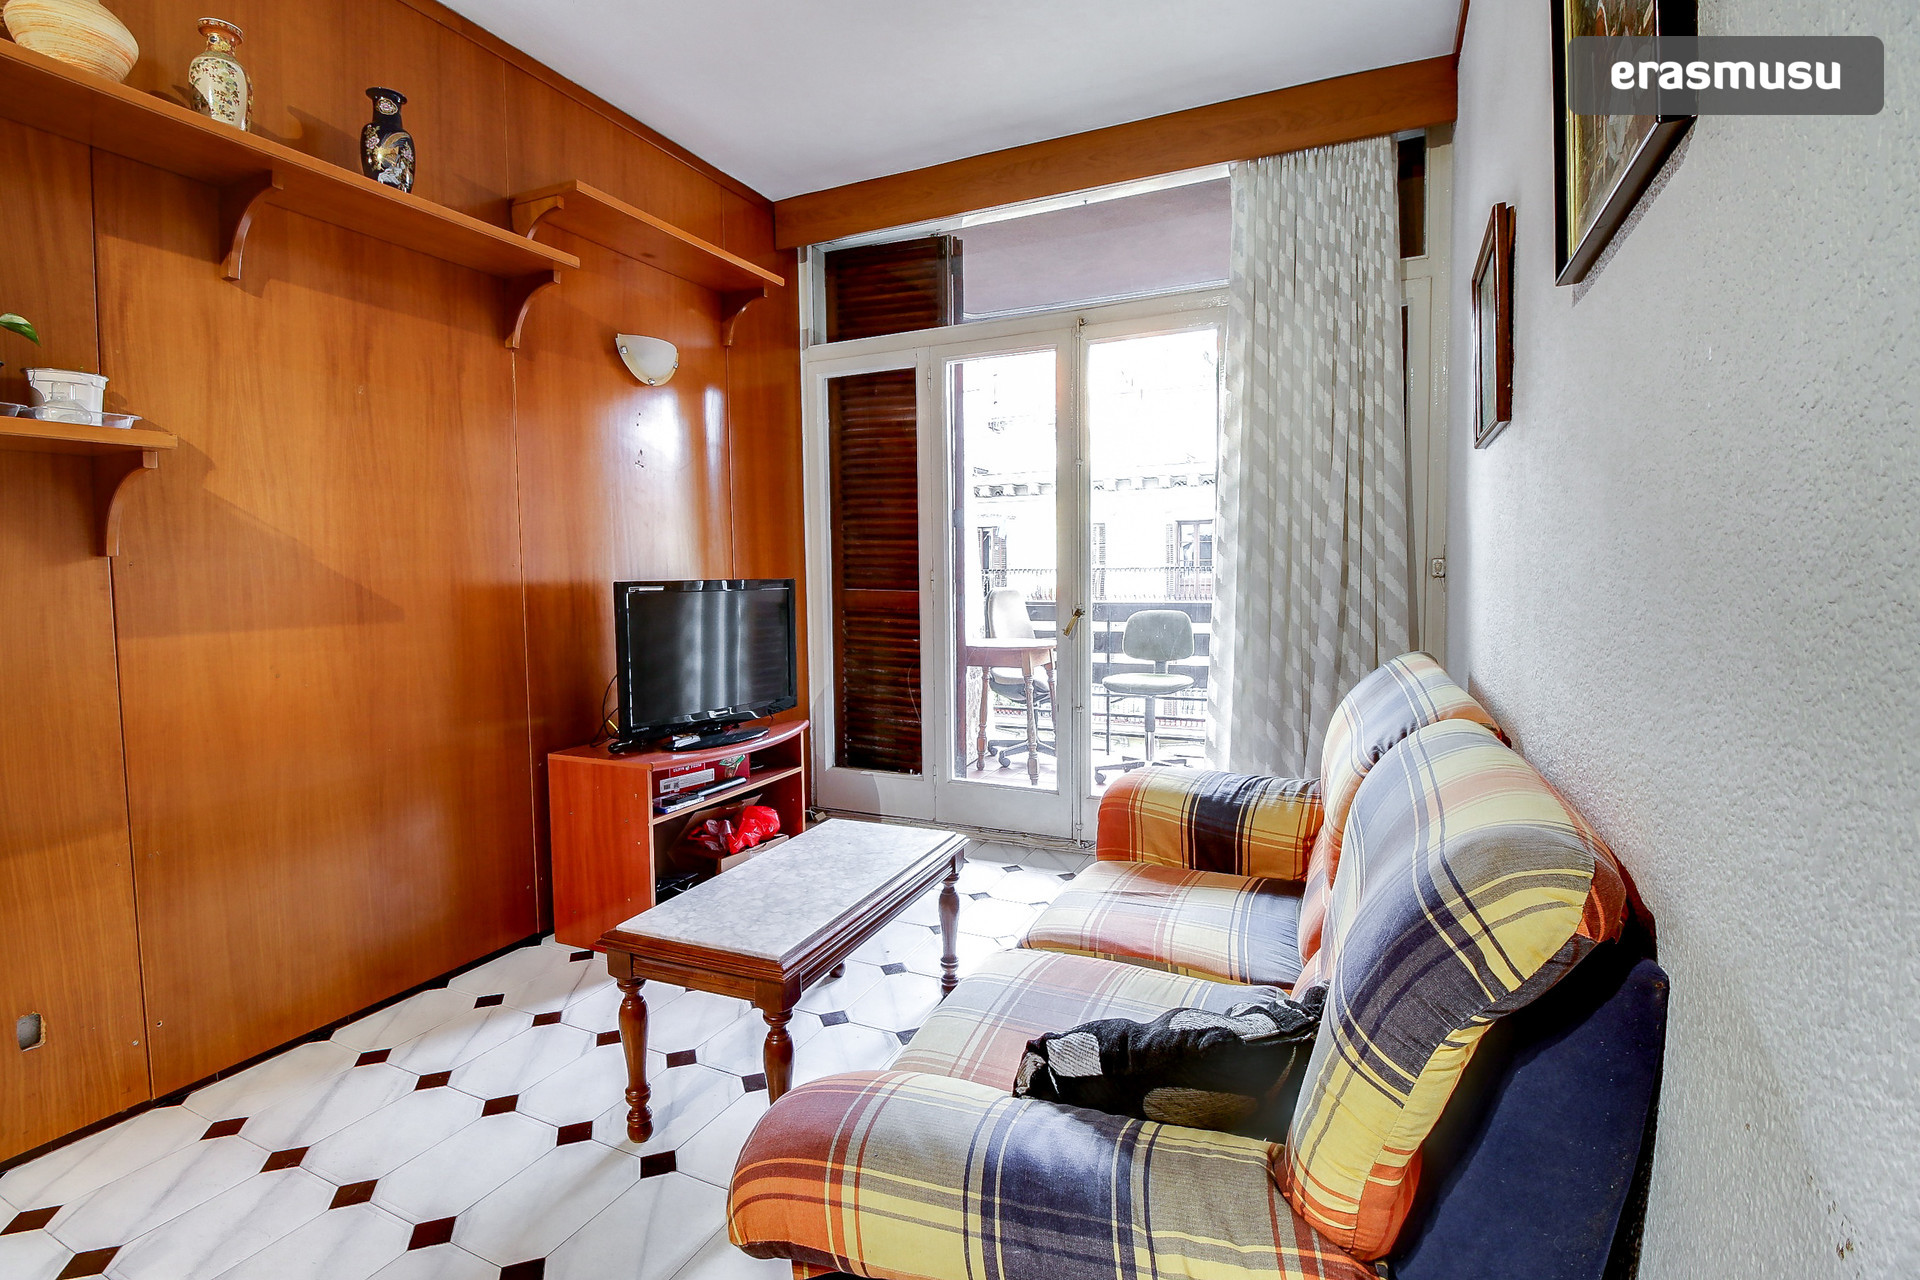 habitacion-chollo-barcelona-0a4b9ffdebec